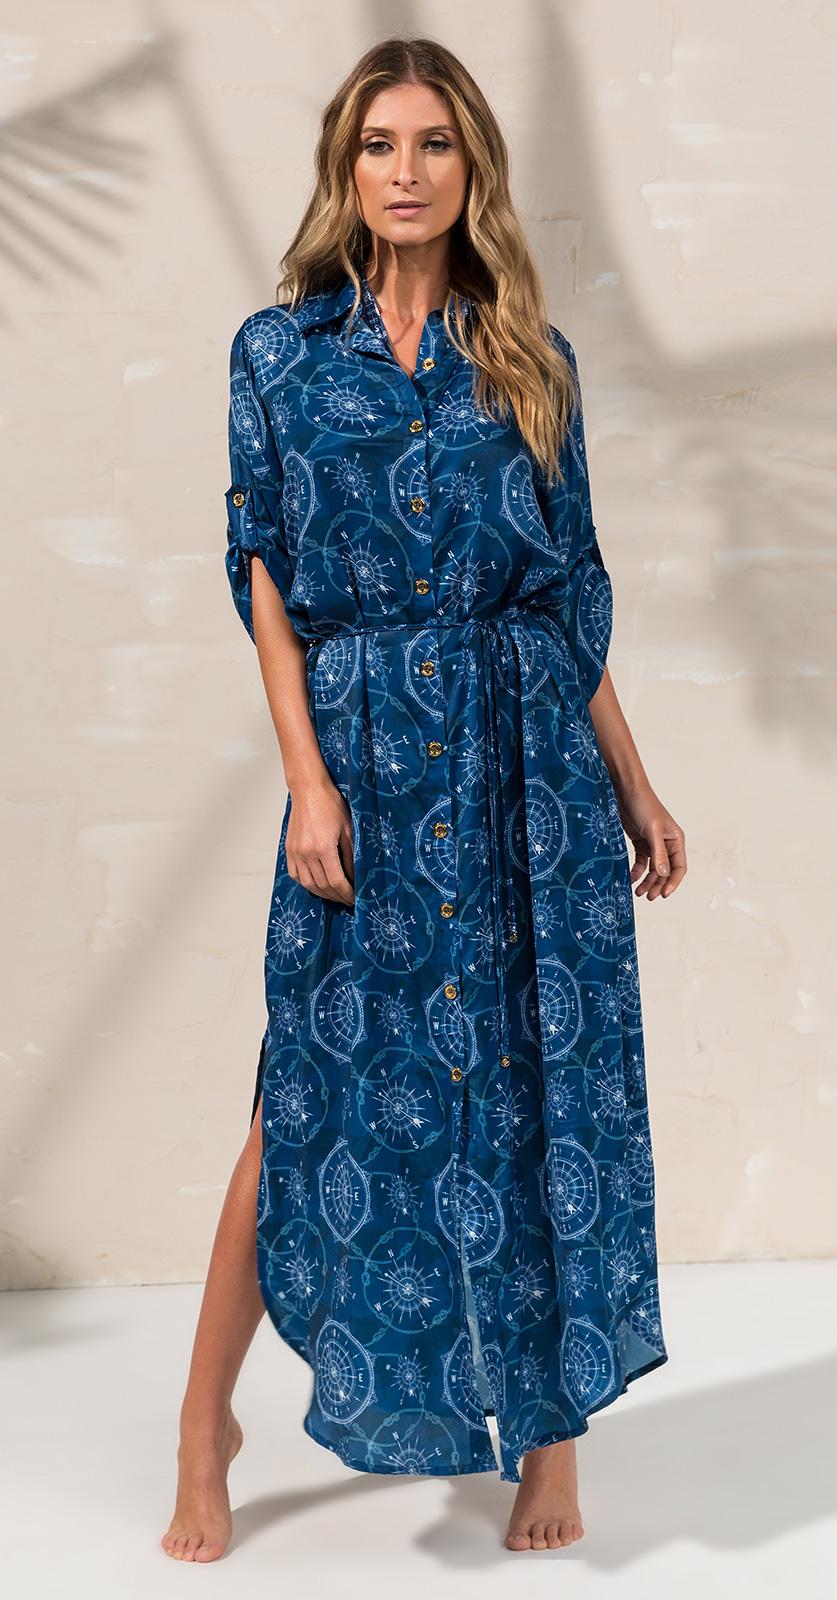 02e1902bcb2b Μακρύ φόρεμα με κουμπιά και εμπριμέ μοτίβα σε ναυτικό μπλε χρώμα ...